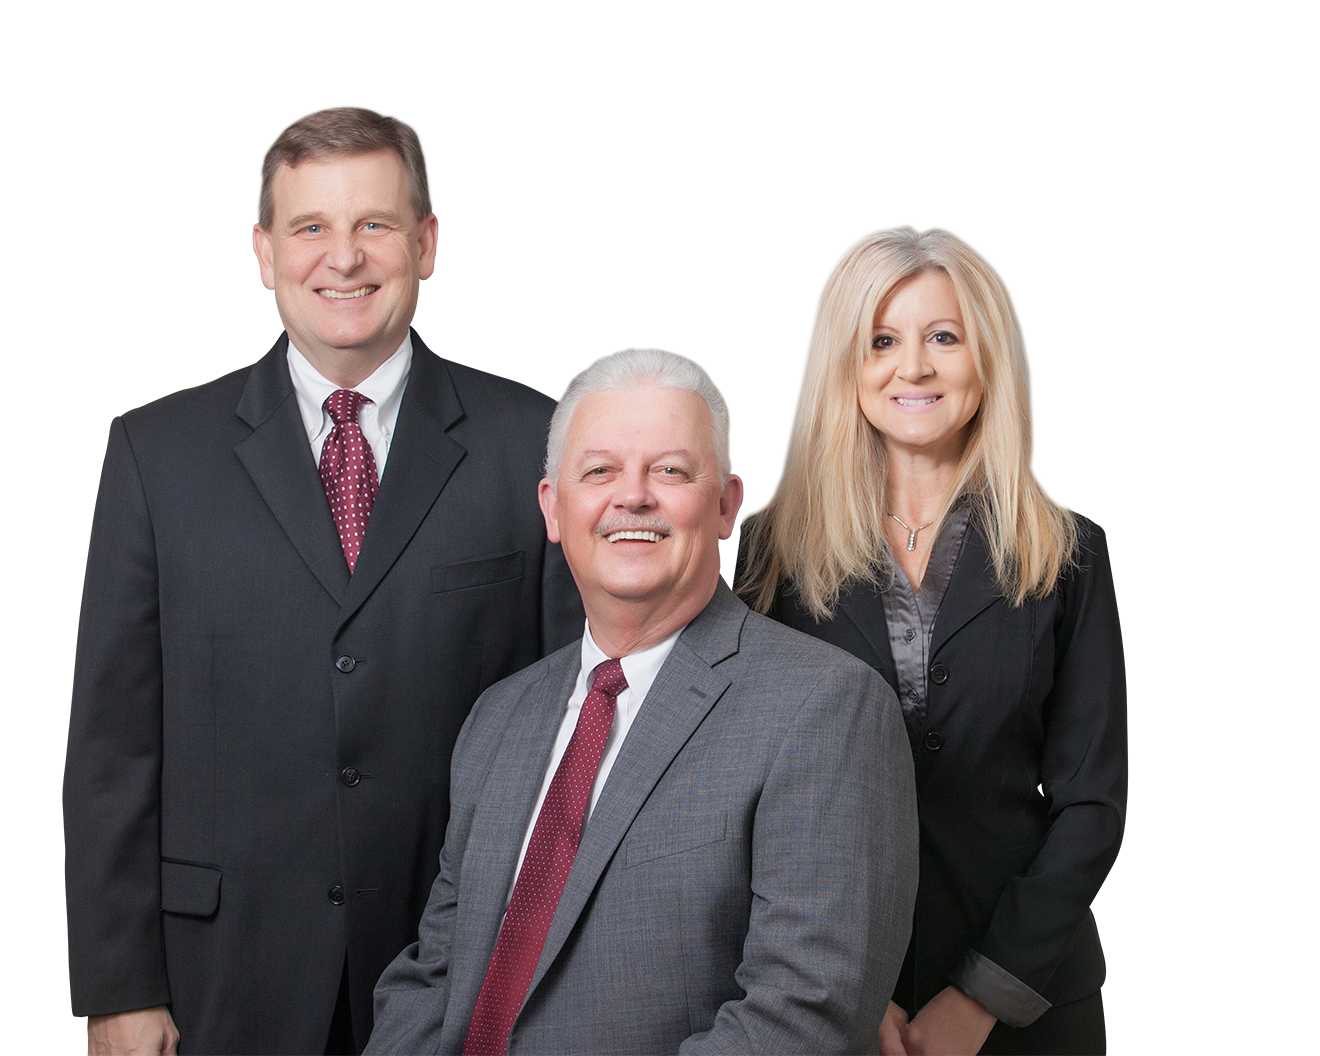 The Randy Martin Team